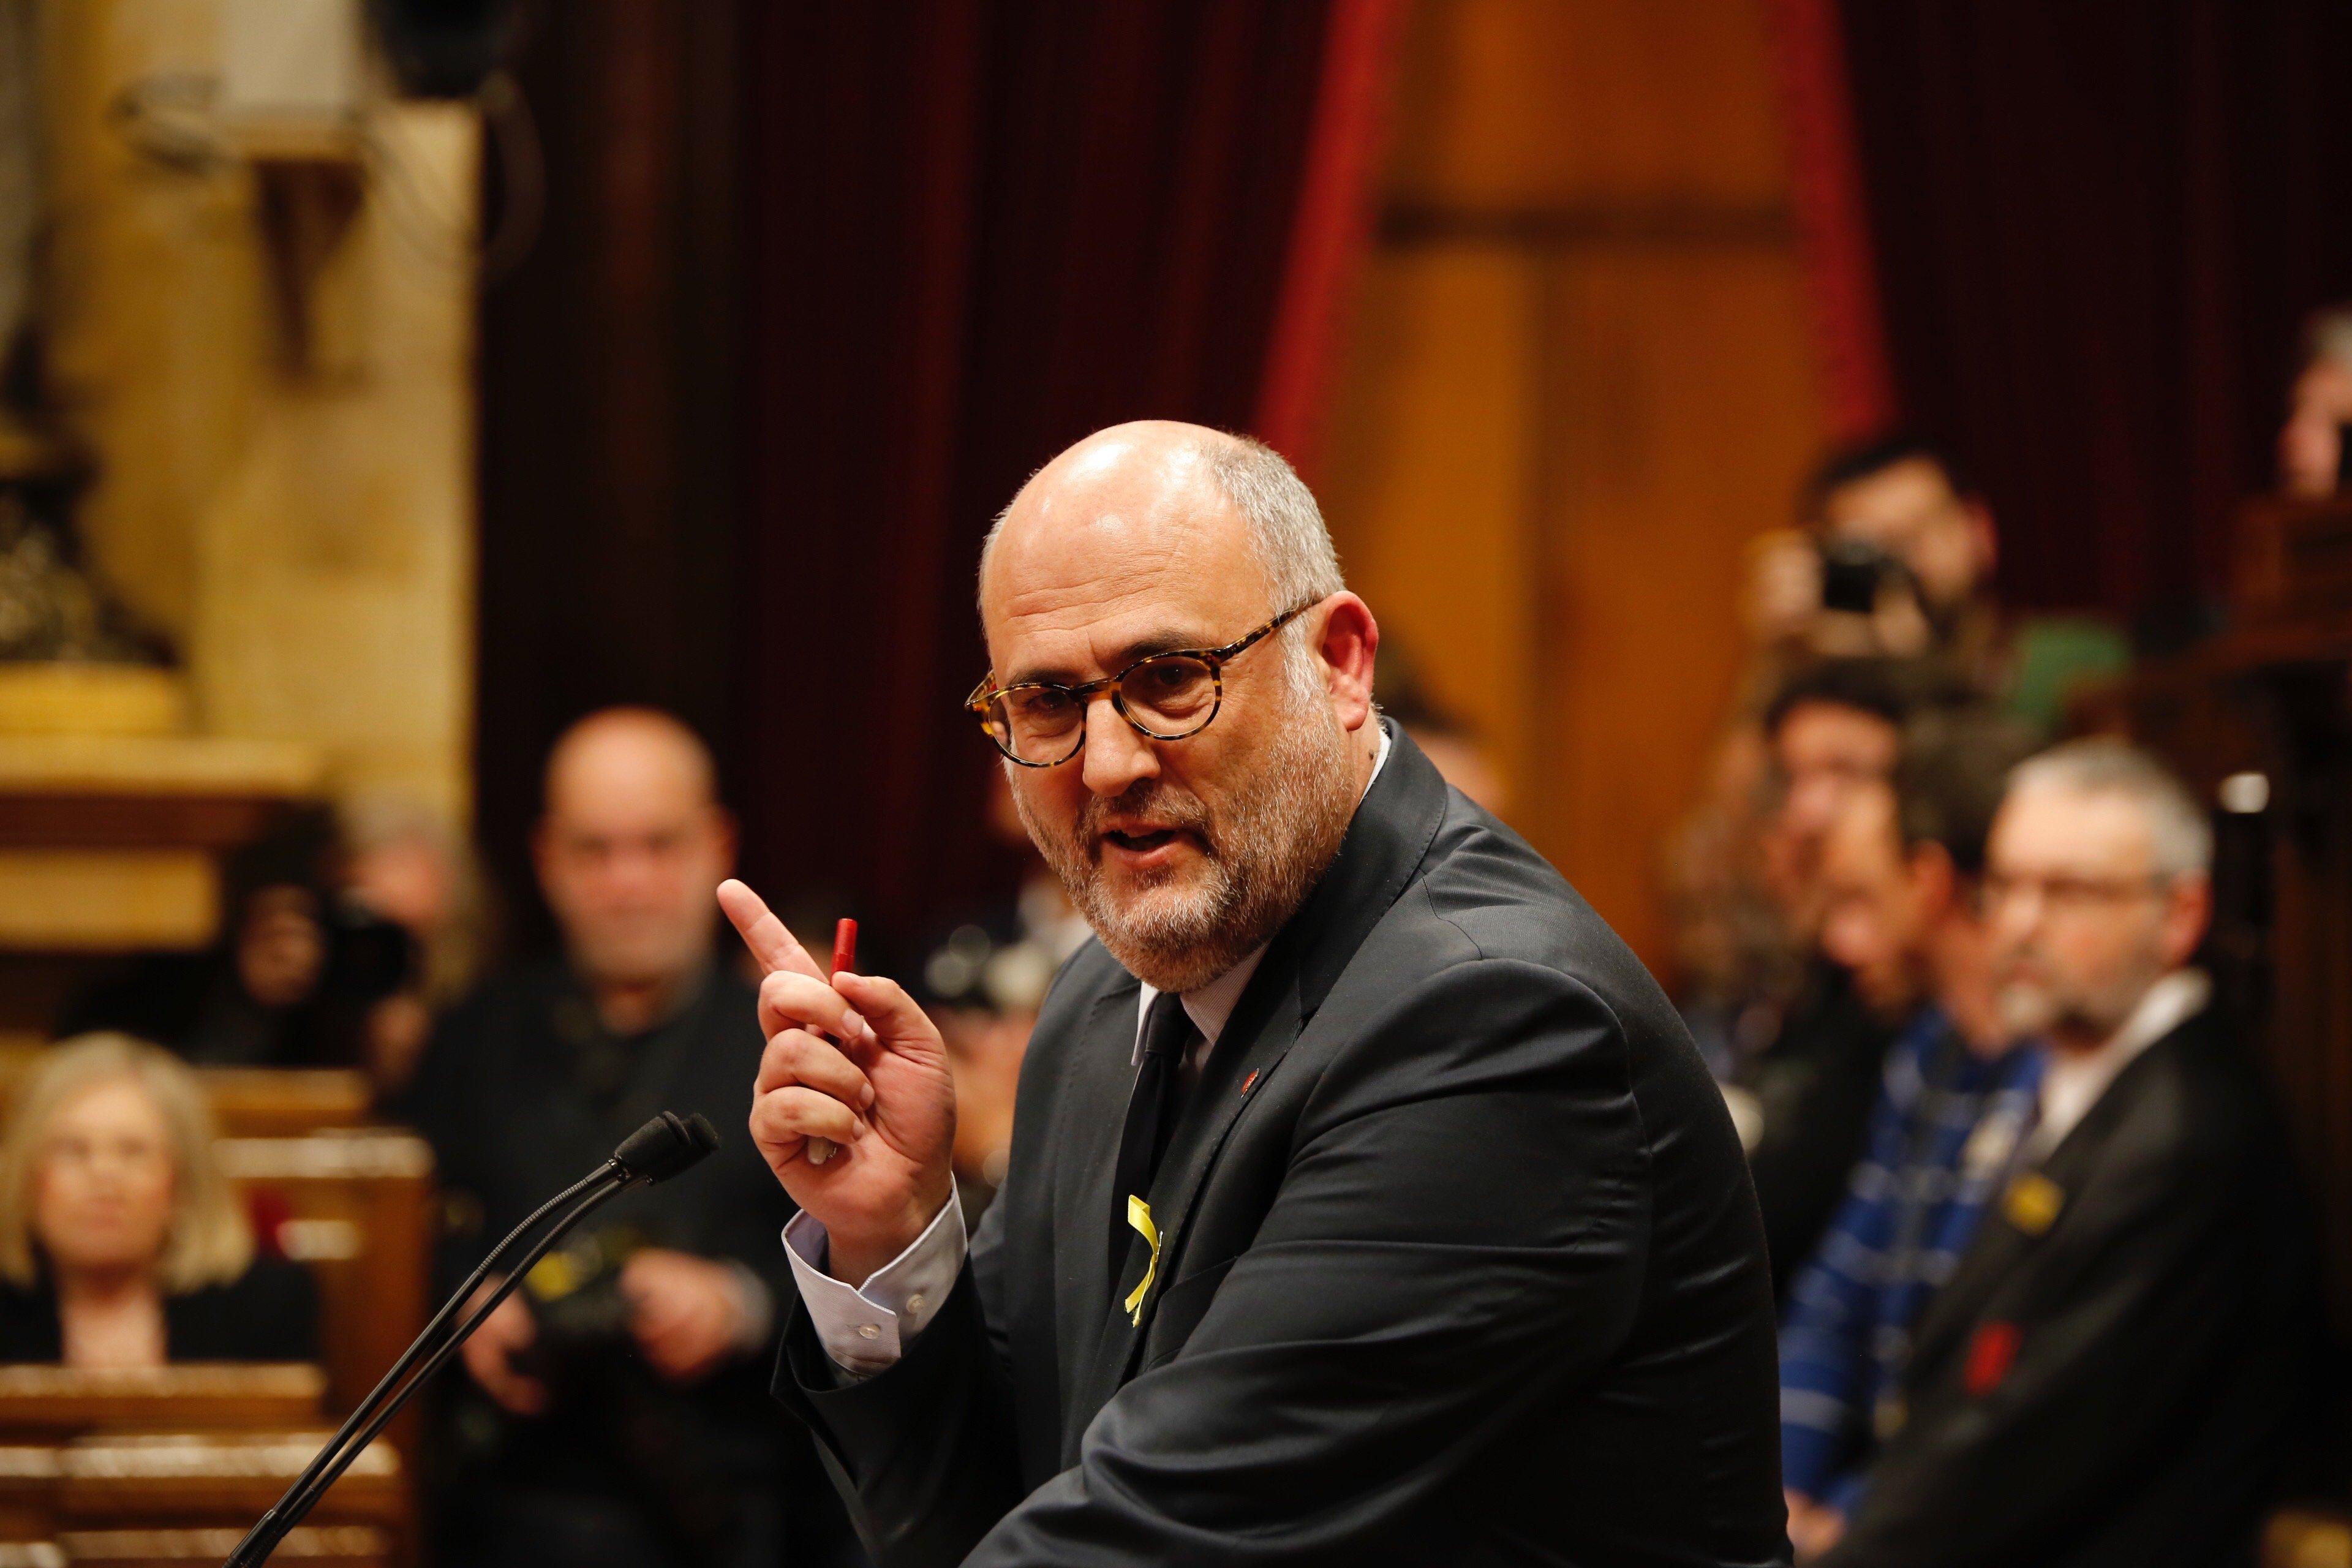 eduard pujol ple parlament sergi alcazar (3)